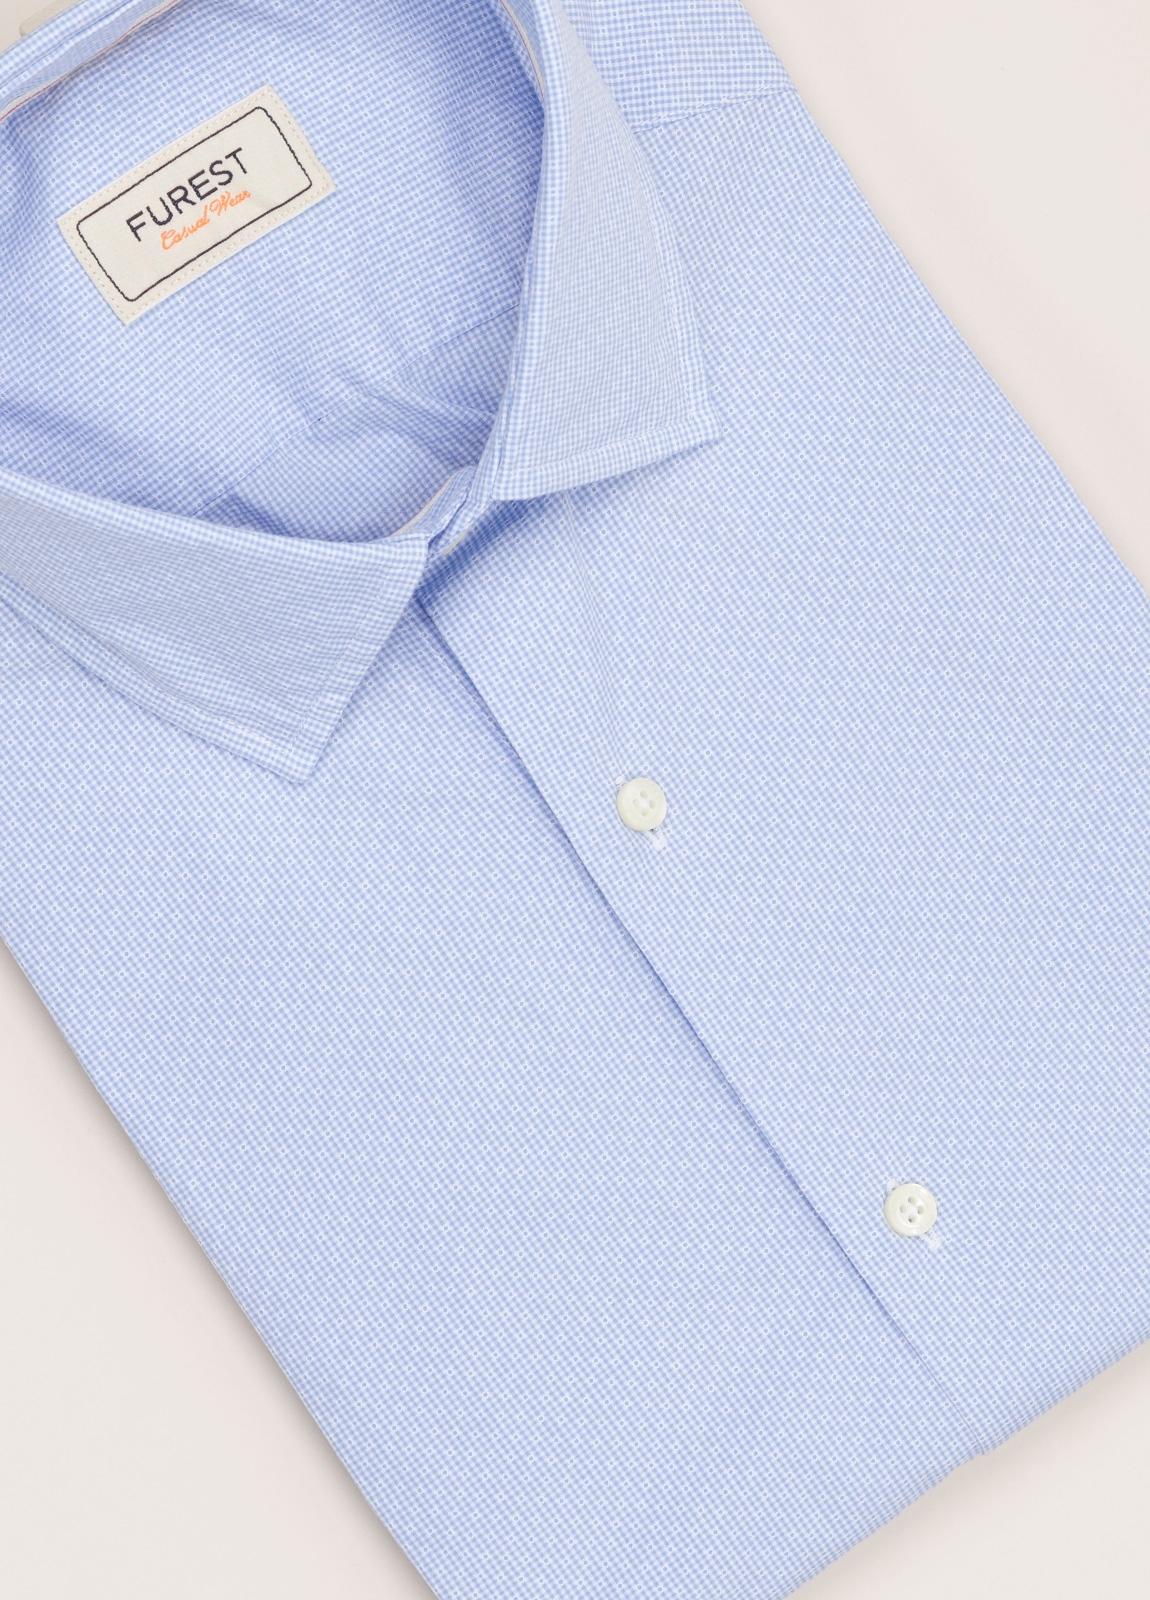 Camisa Casual Wear FUREST COLECCIÓN slim fit fil dibujo celeste - Ítem2